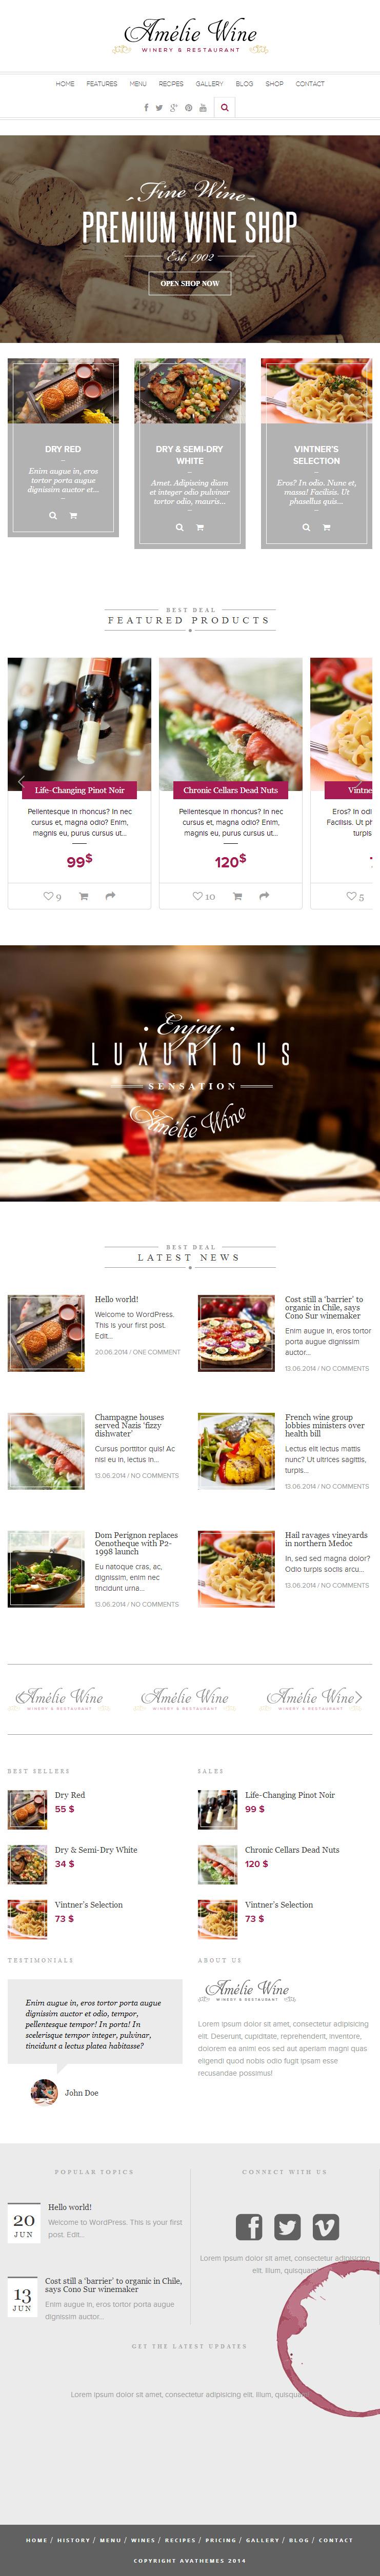 Wine Premium Responsive Restaurant Flat Wordpress Theme